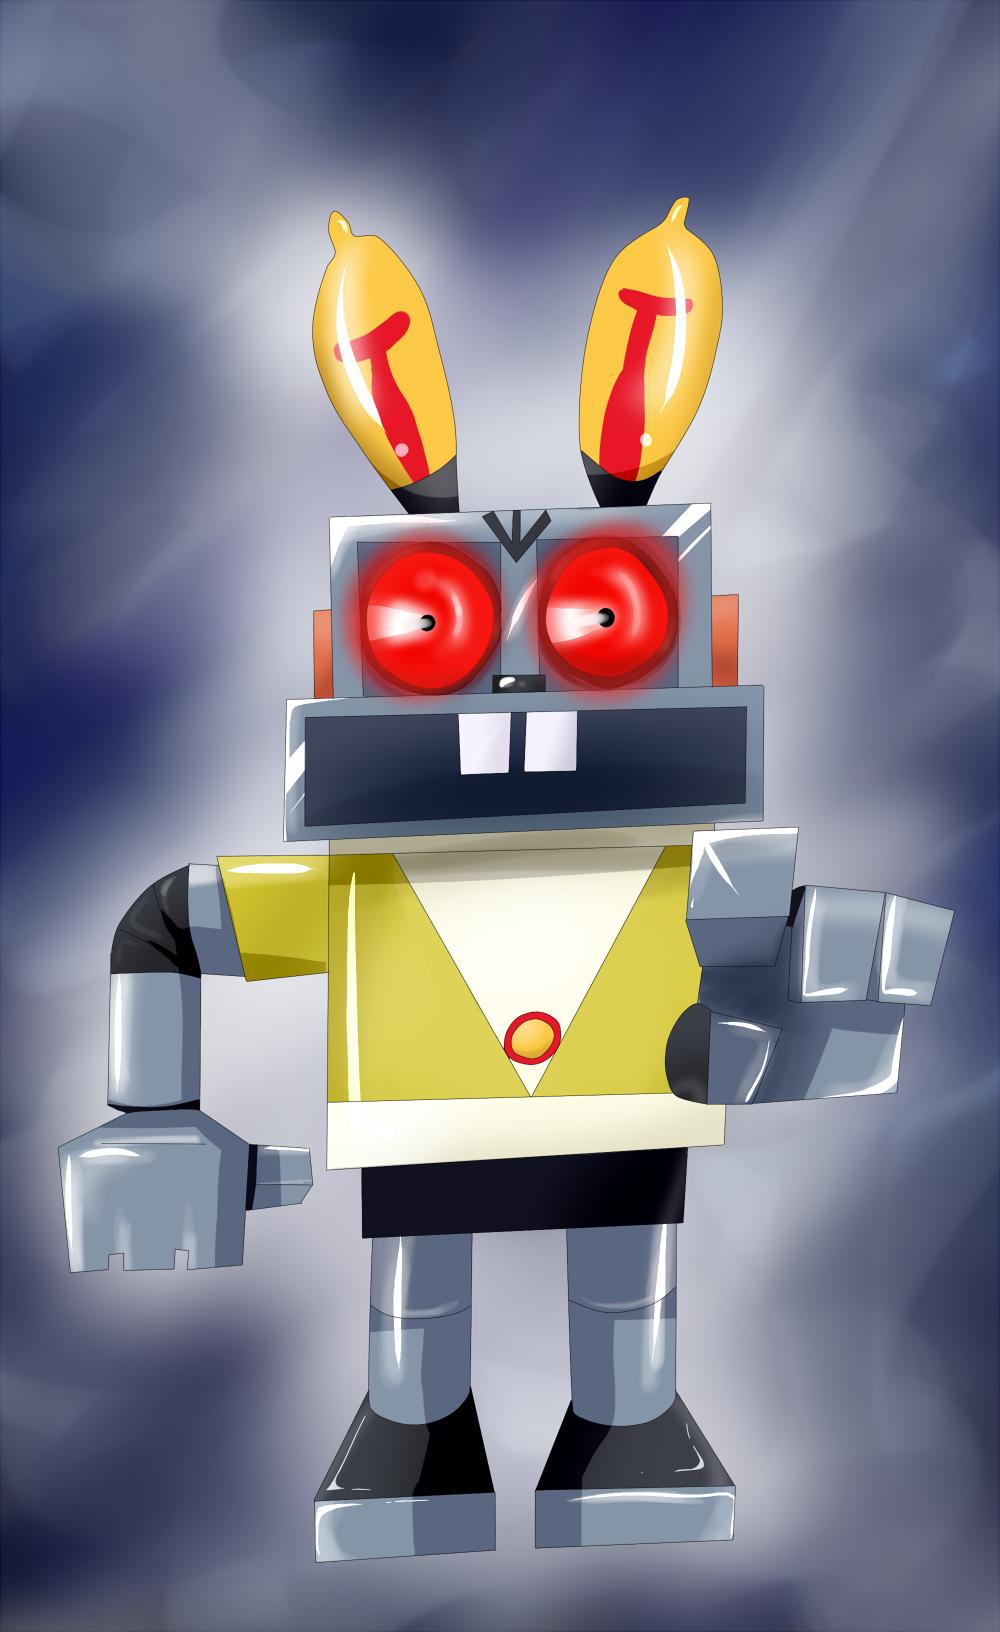 Robot Hare by Riadorana on DeviantArt